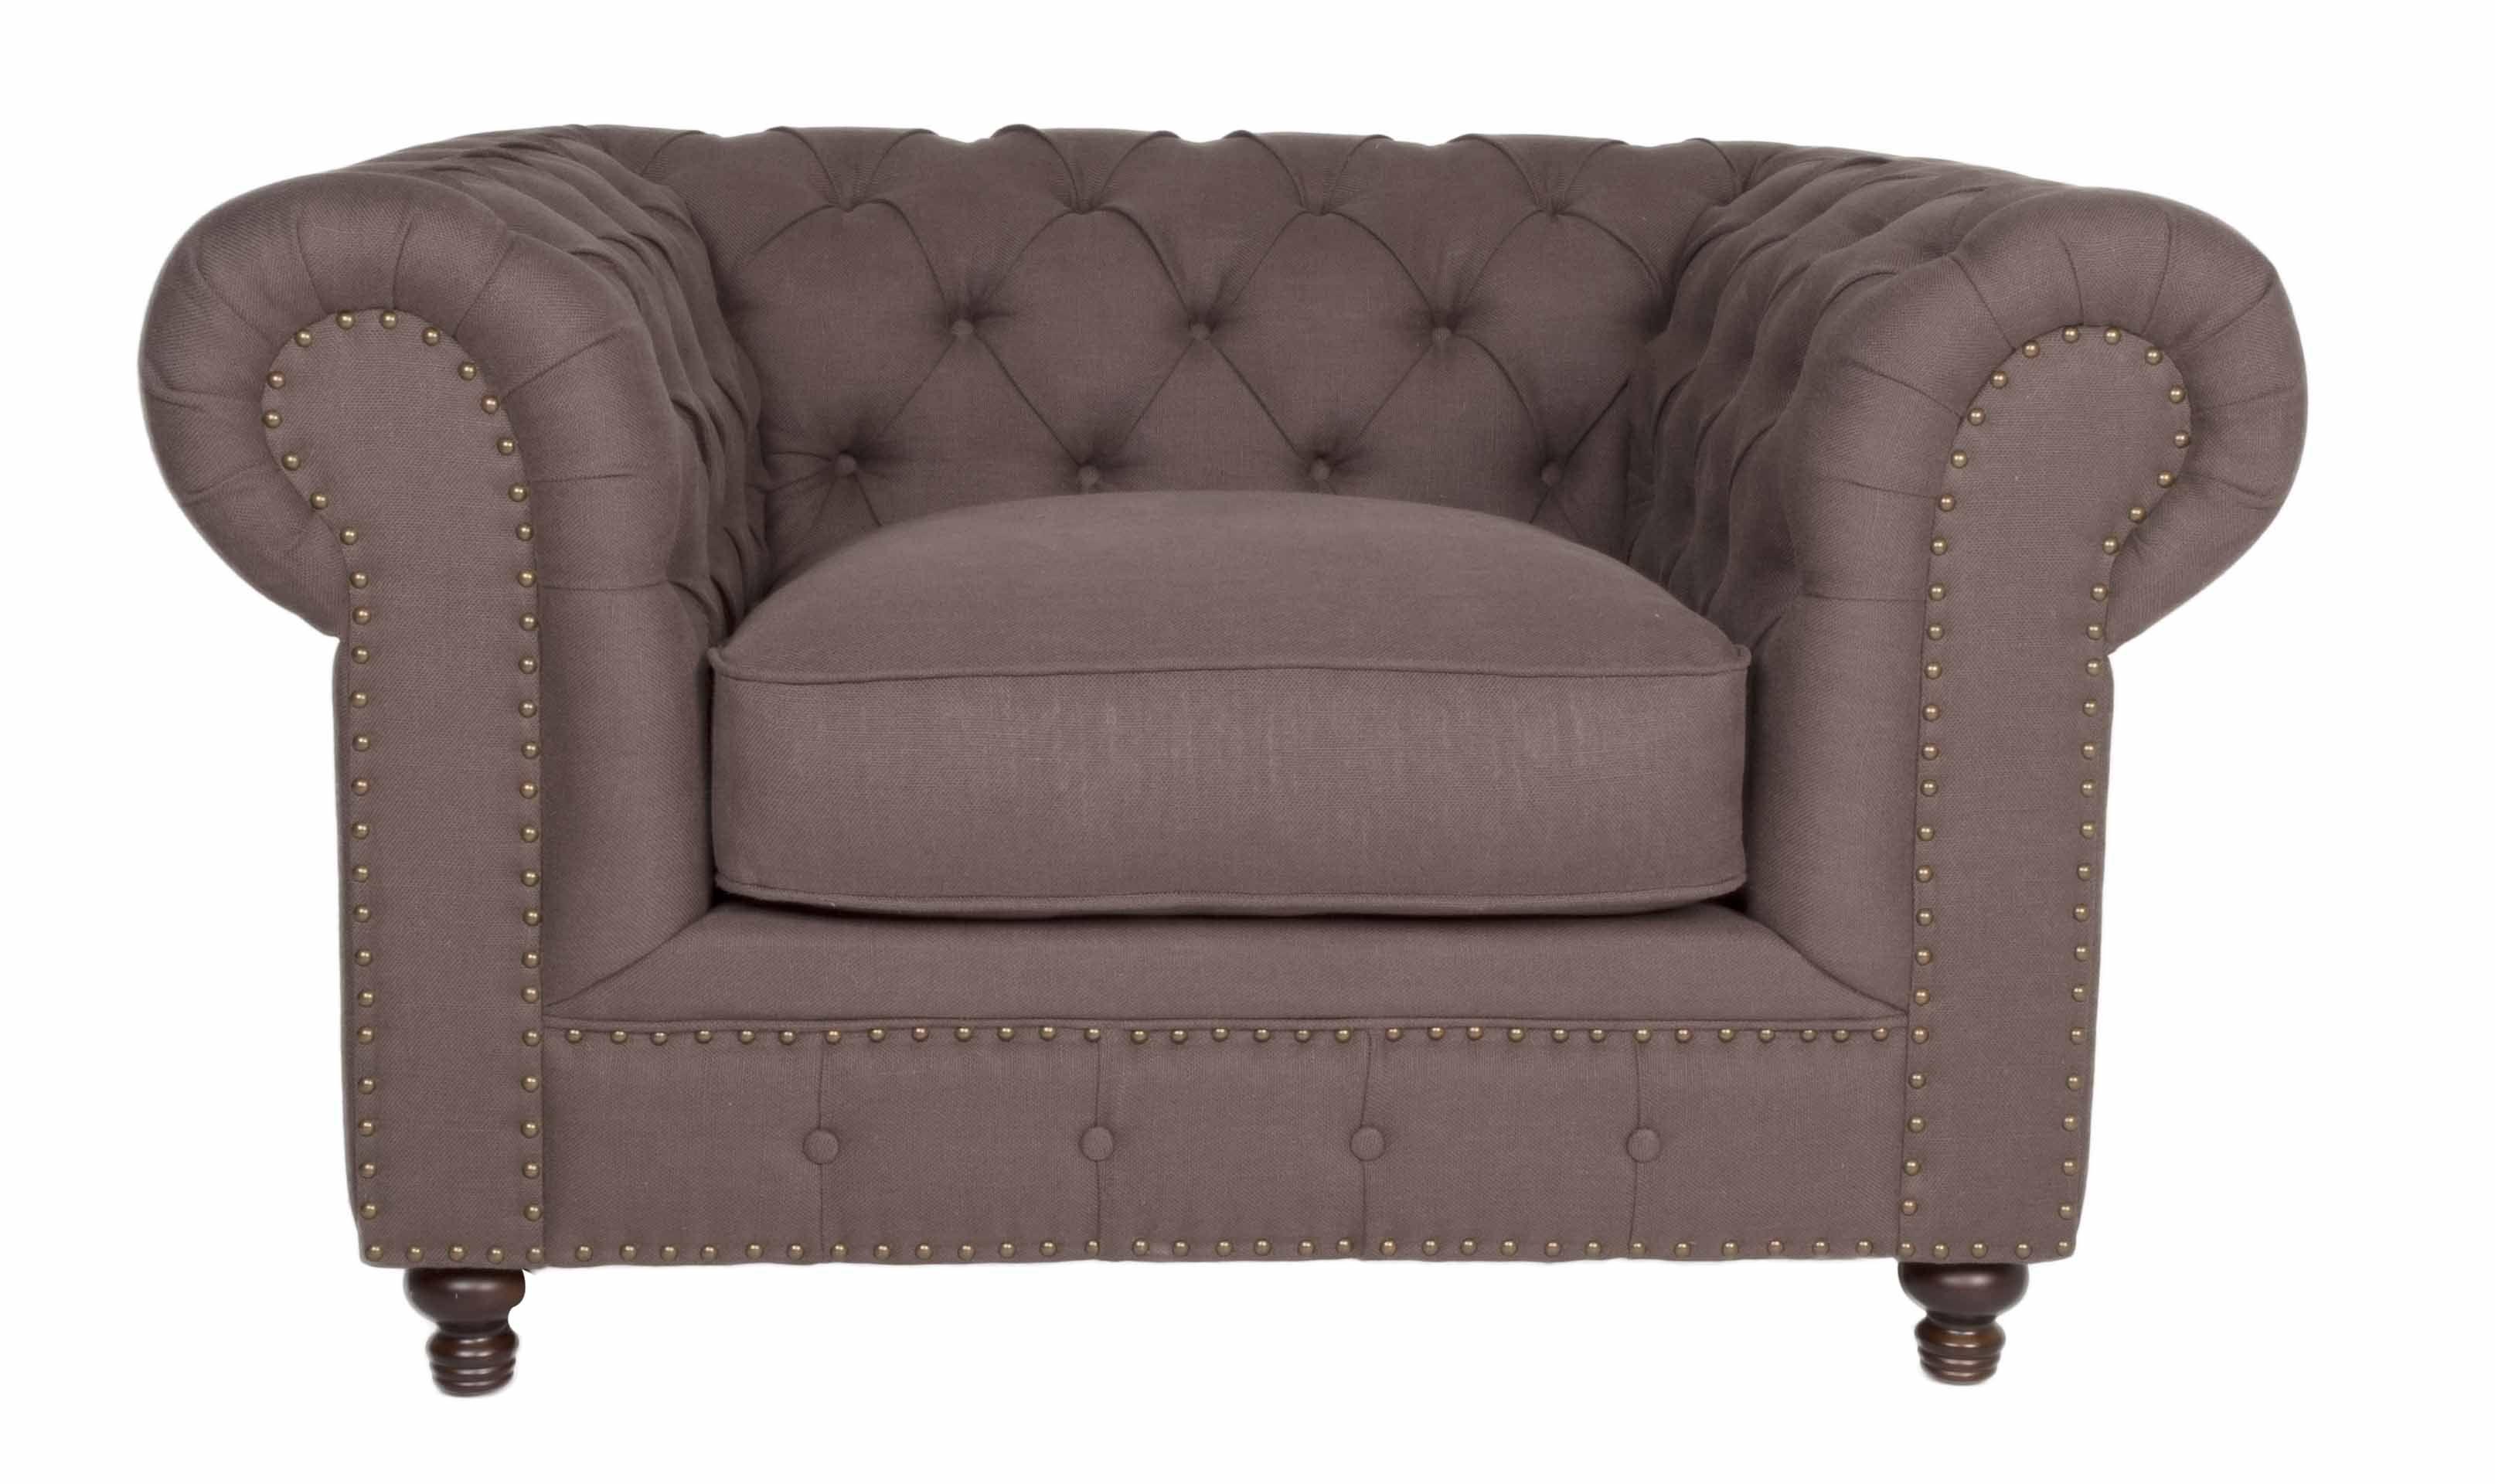 Belgian Linen Sofa Sales Online Cunningham Chair In Coco Matching 89